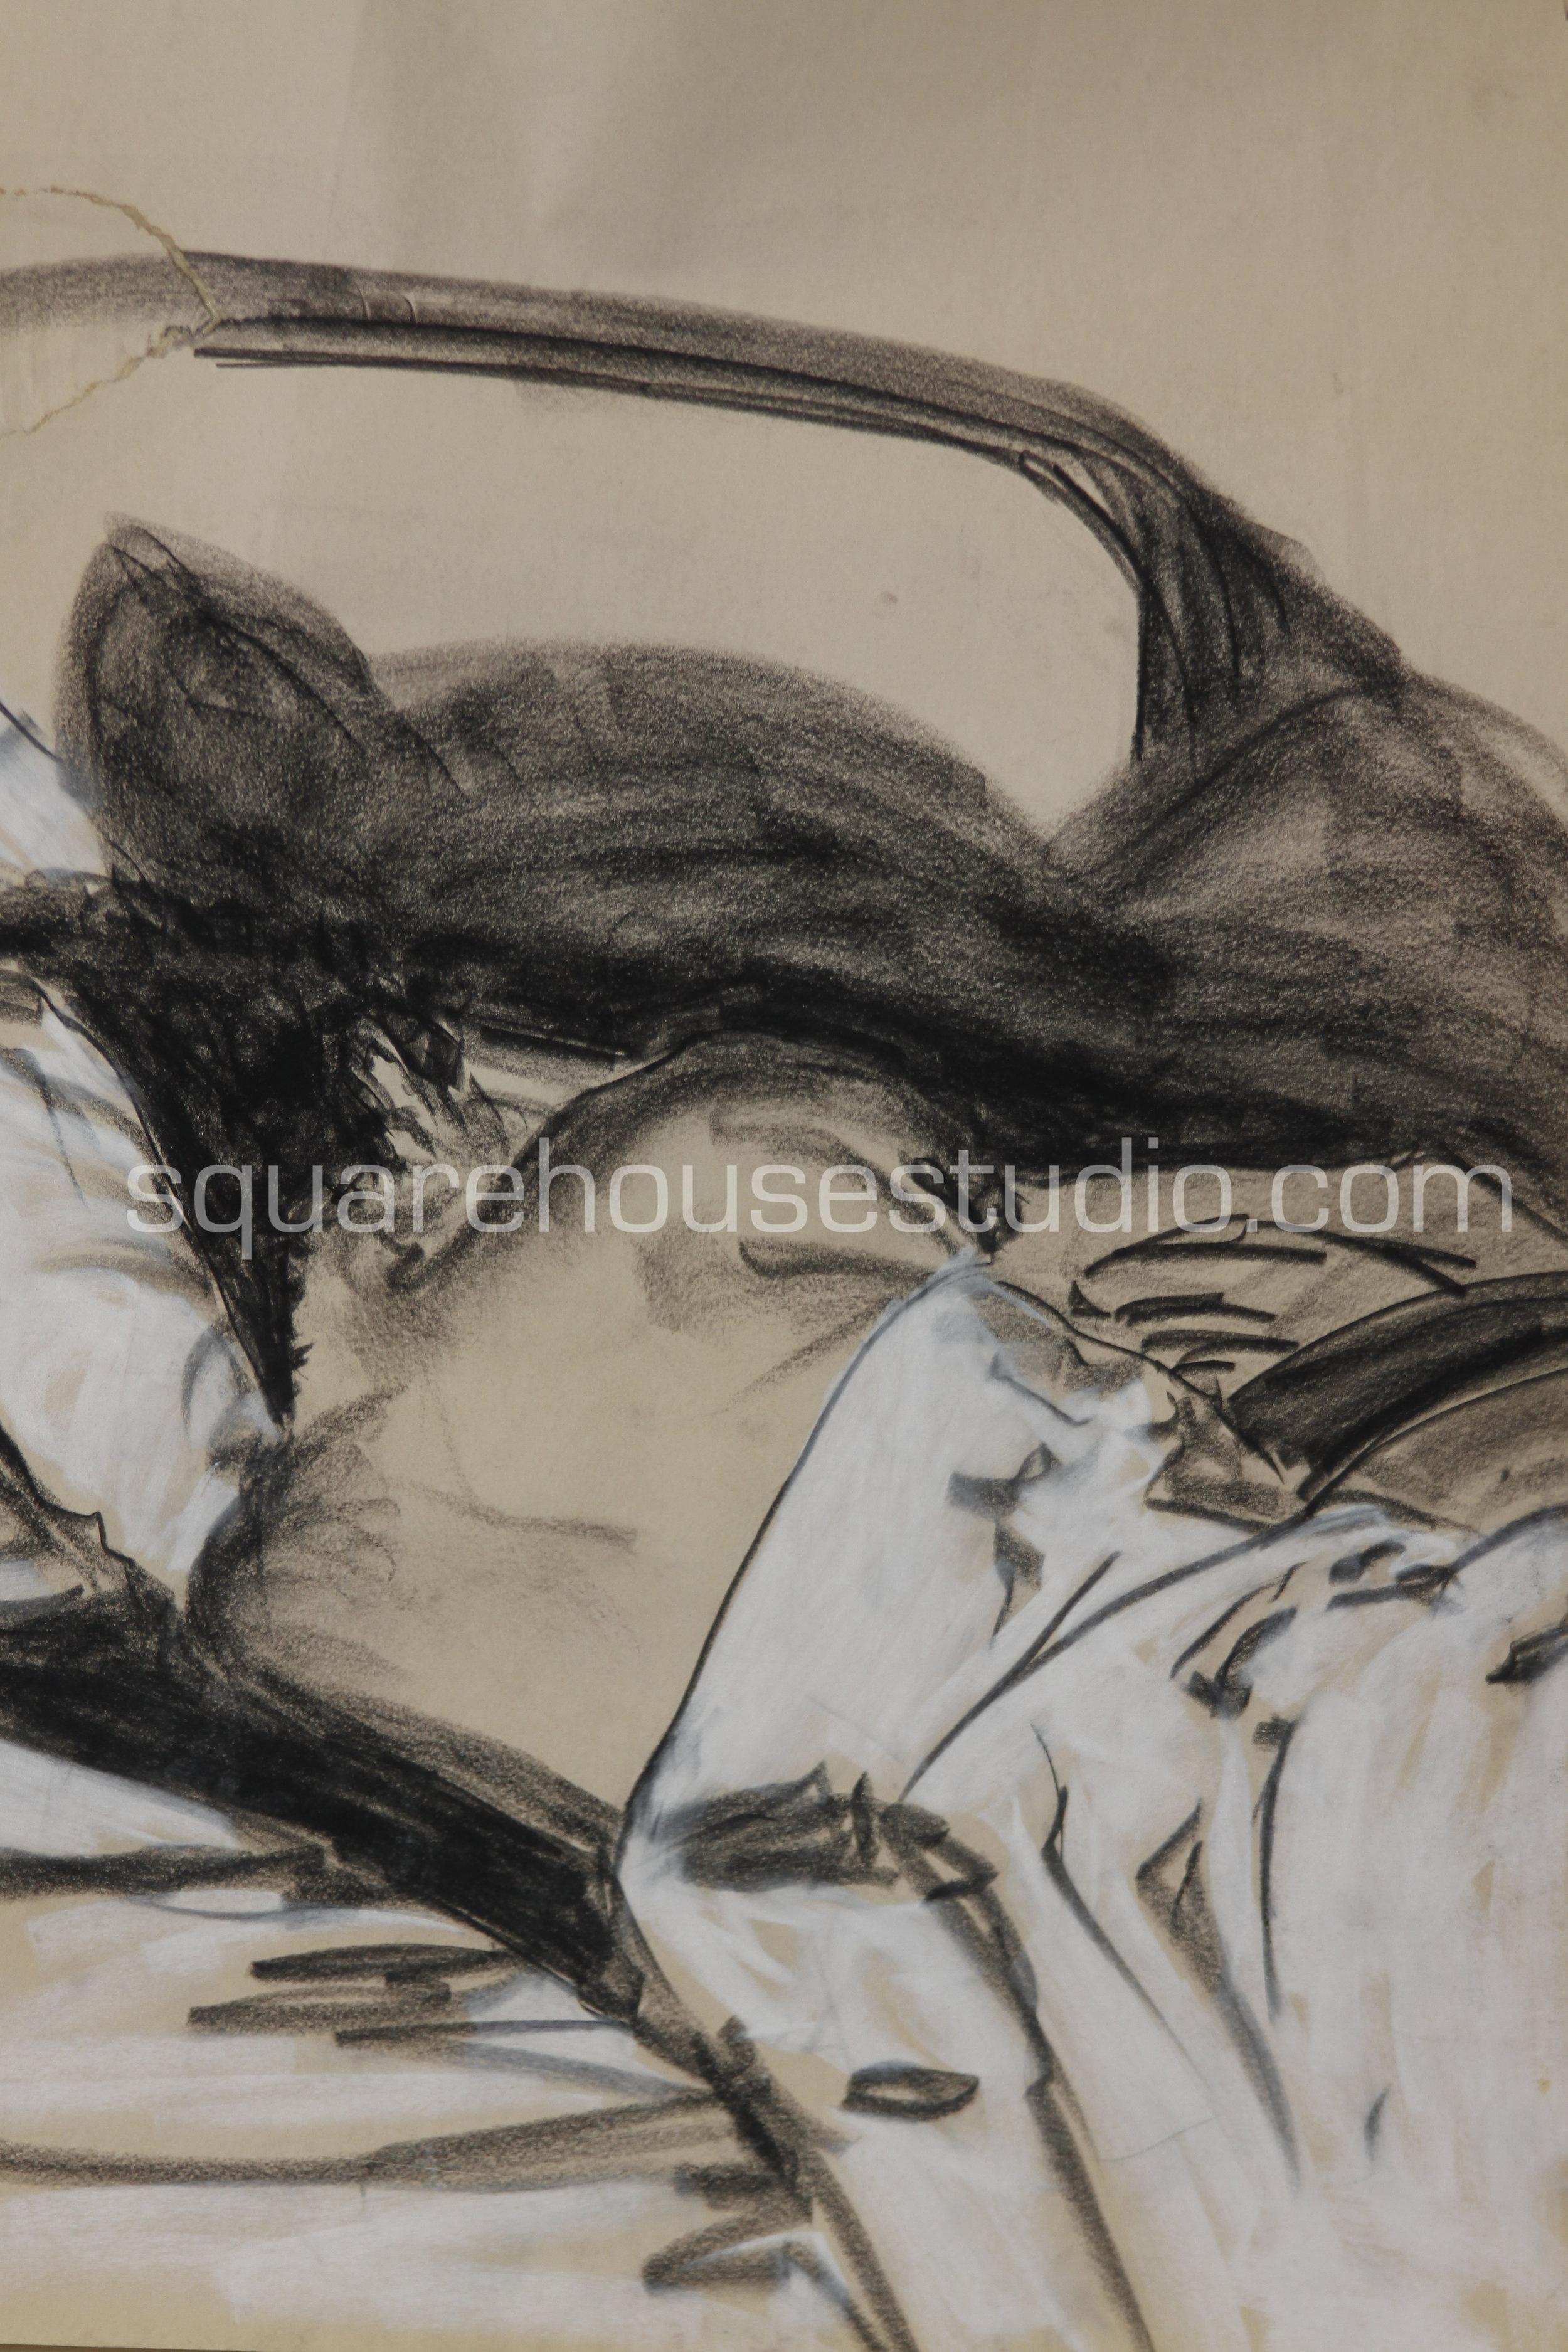 "Slumber , SOLD, 22"" x 32,"" Available as giclée print, $350 framed /$250 unframed"